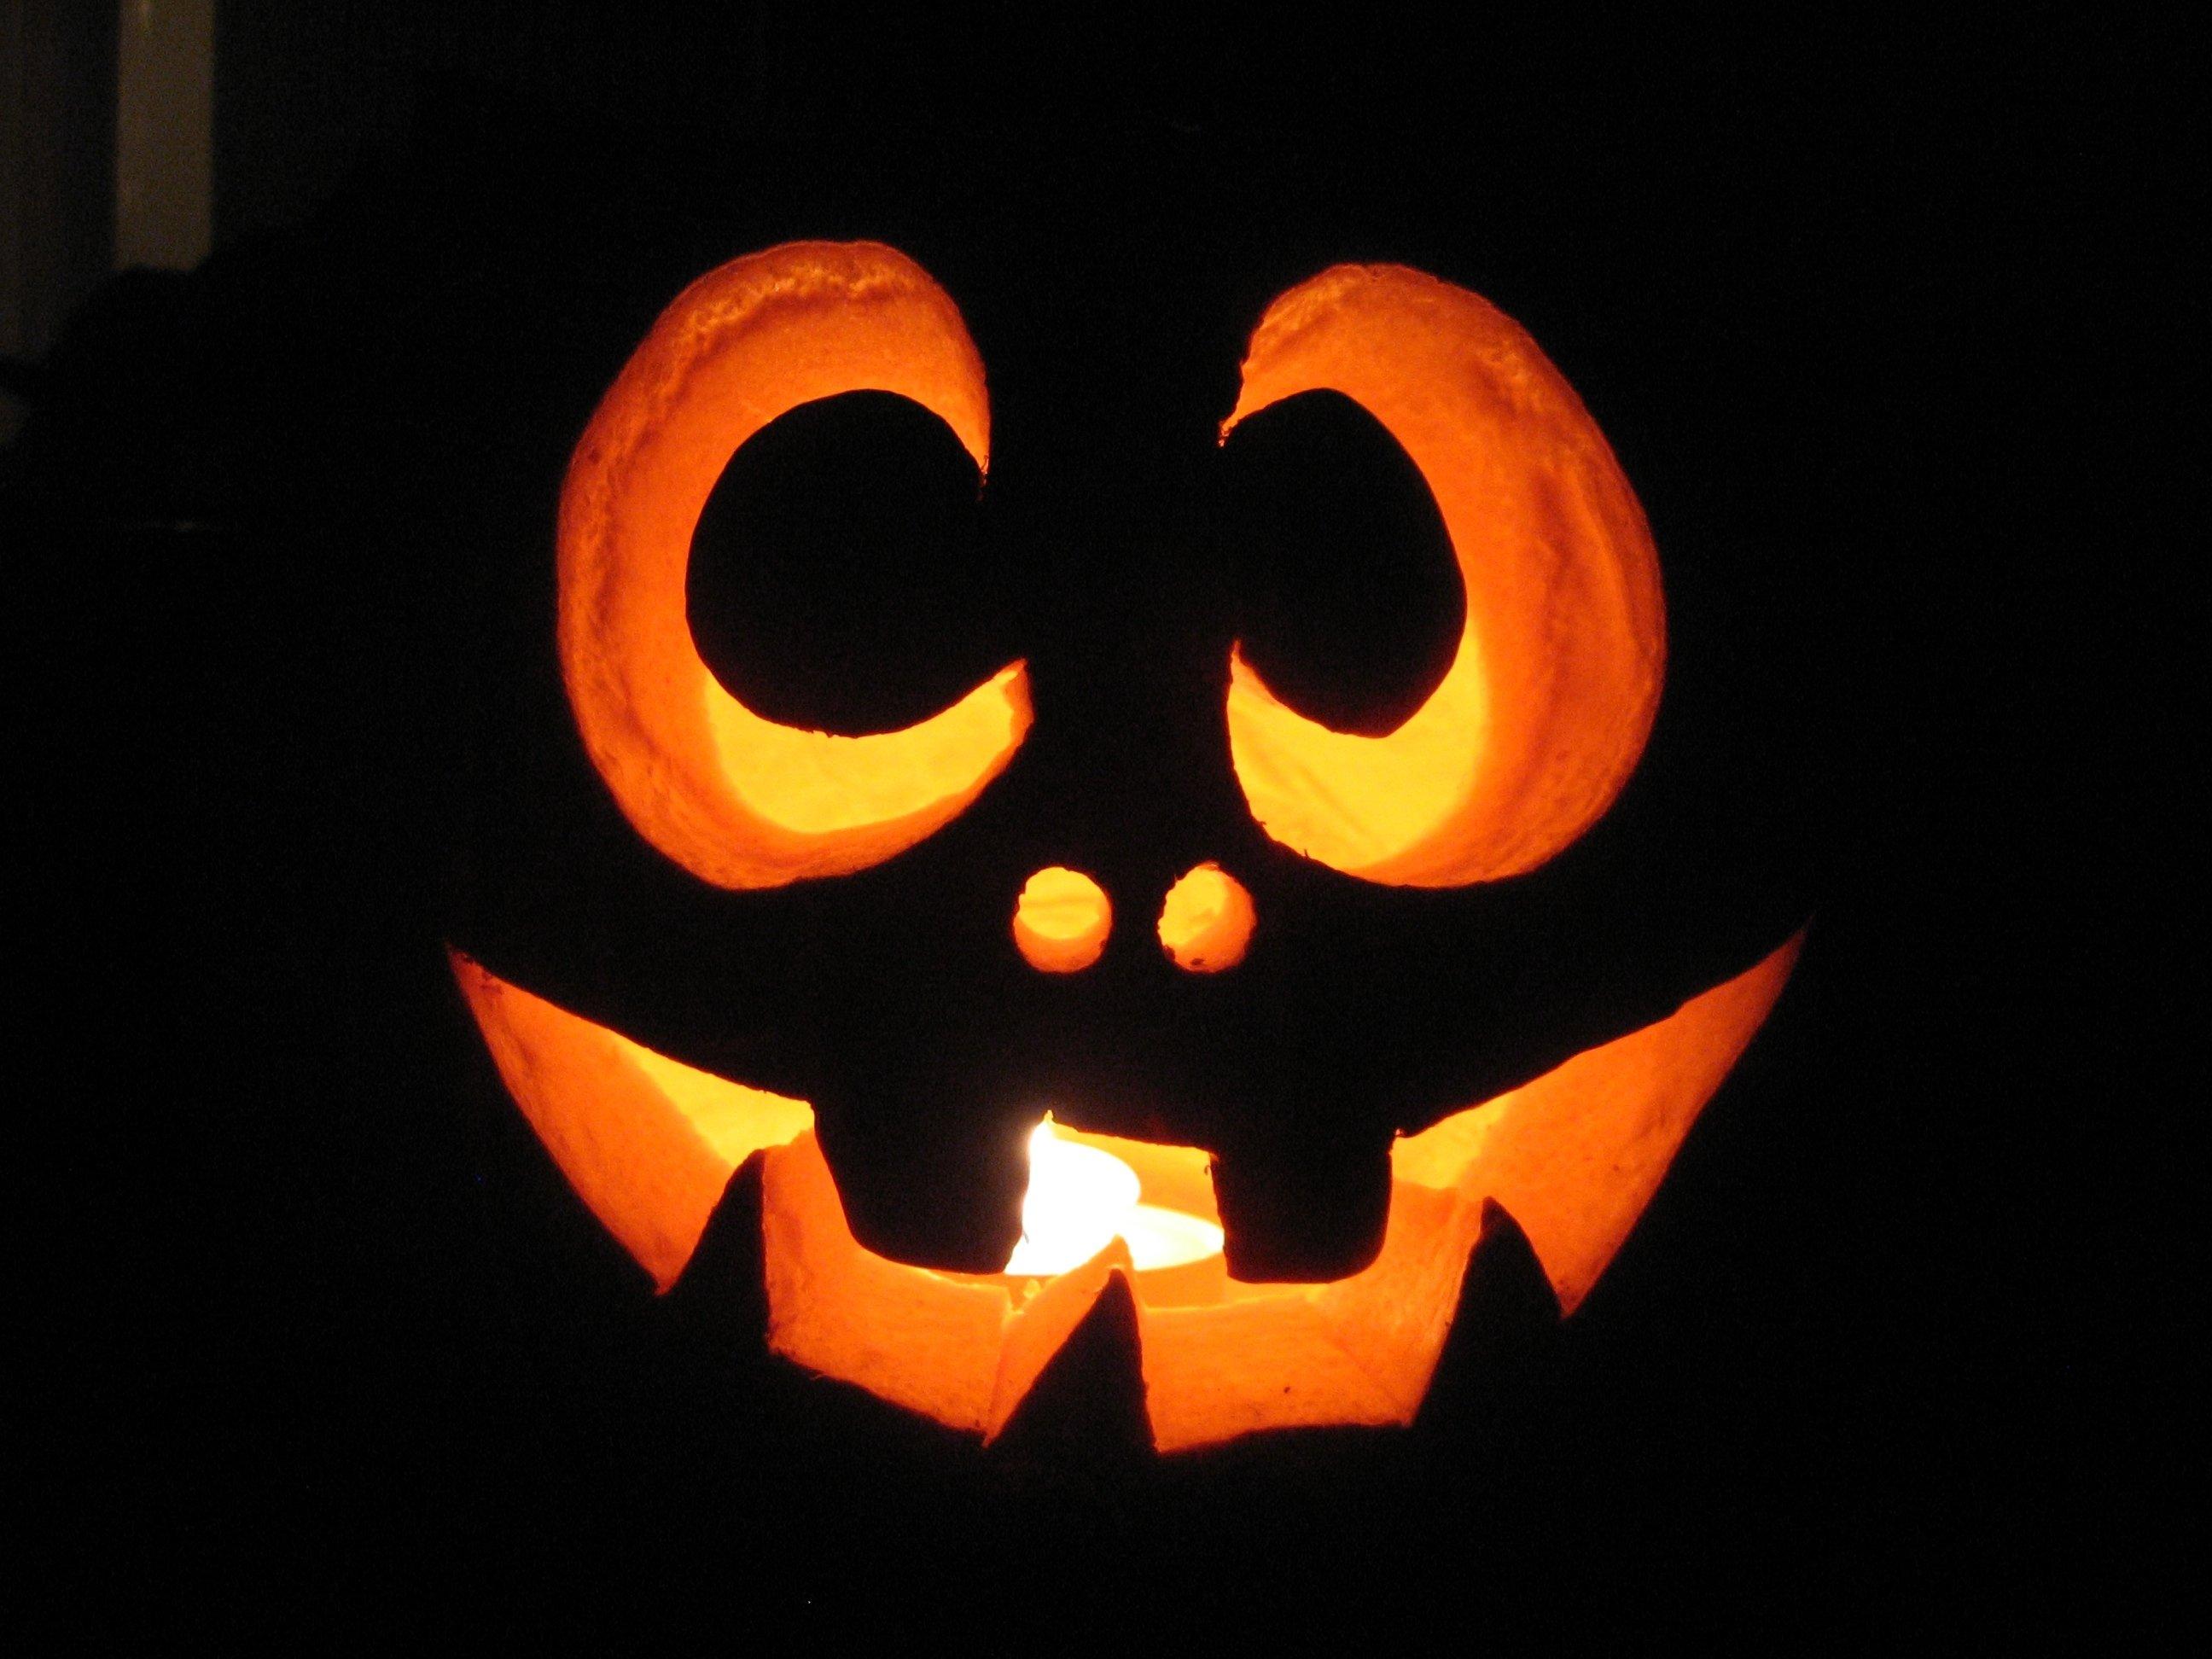 10 Unique Simple Jack O Lantern Ideas heal your open wound pumpkin mouth pumpkin carving and pumpkin 1 2020